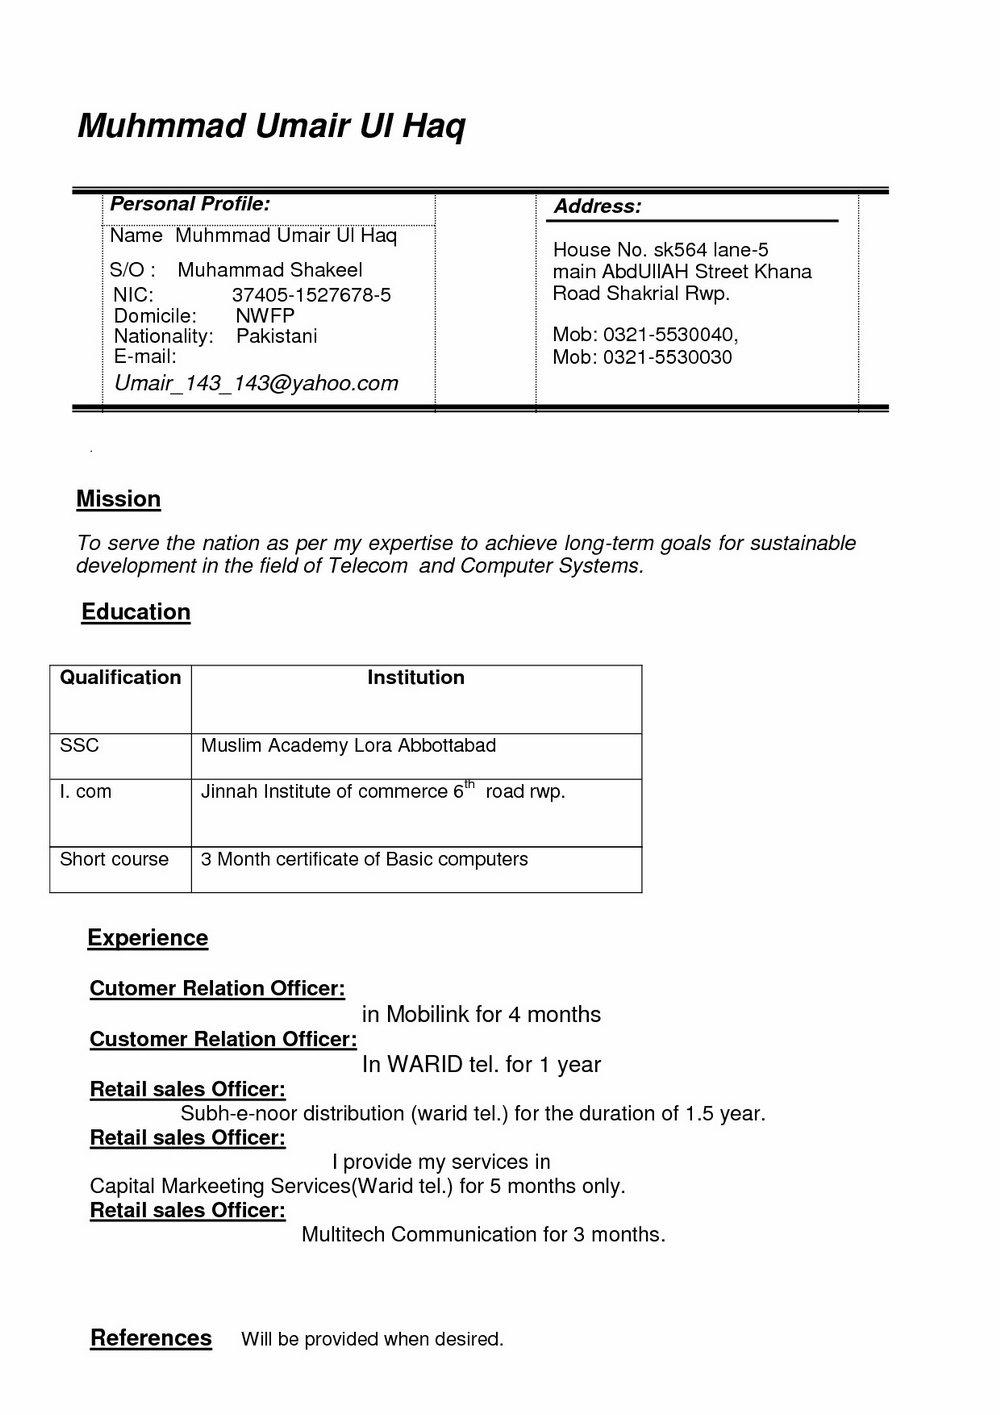 Latest Resume Format Doc For Freshers